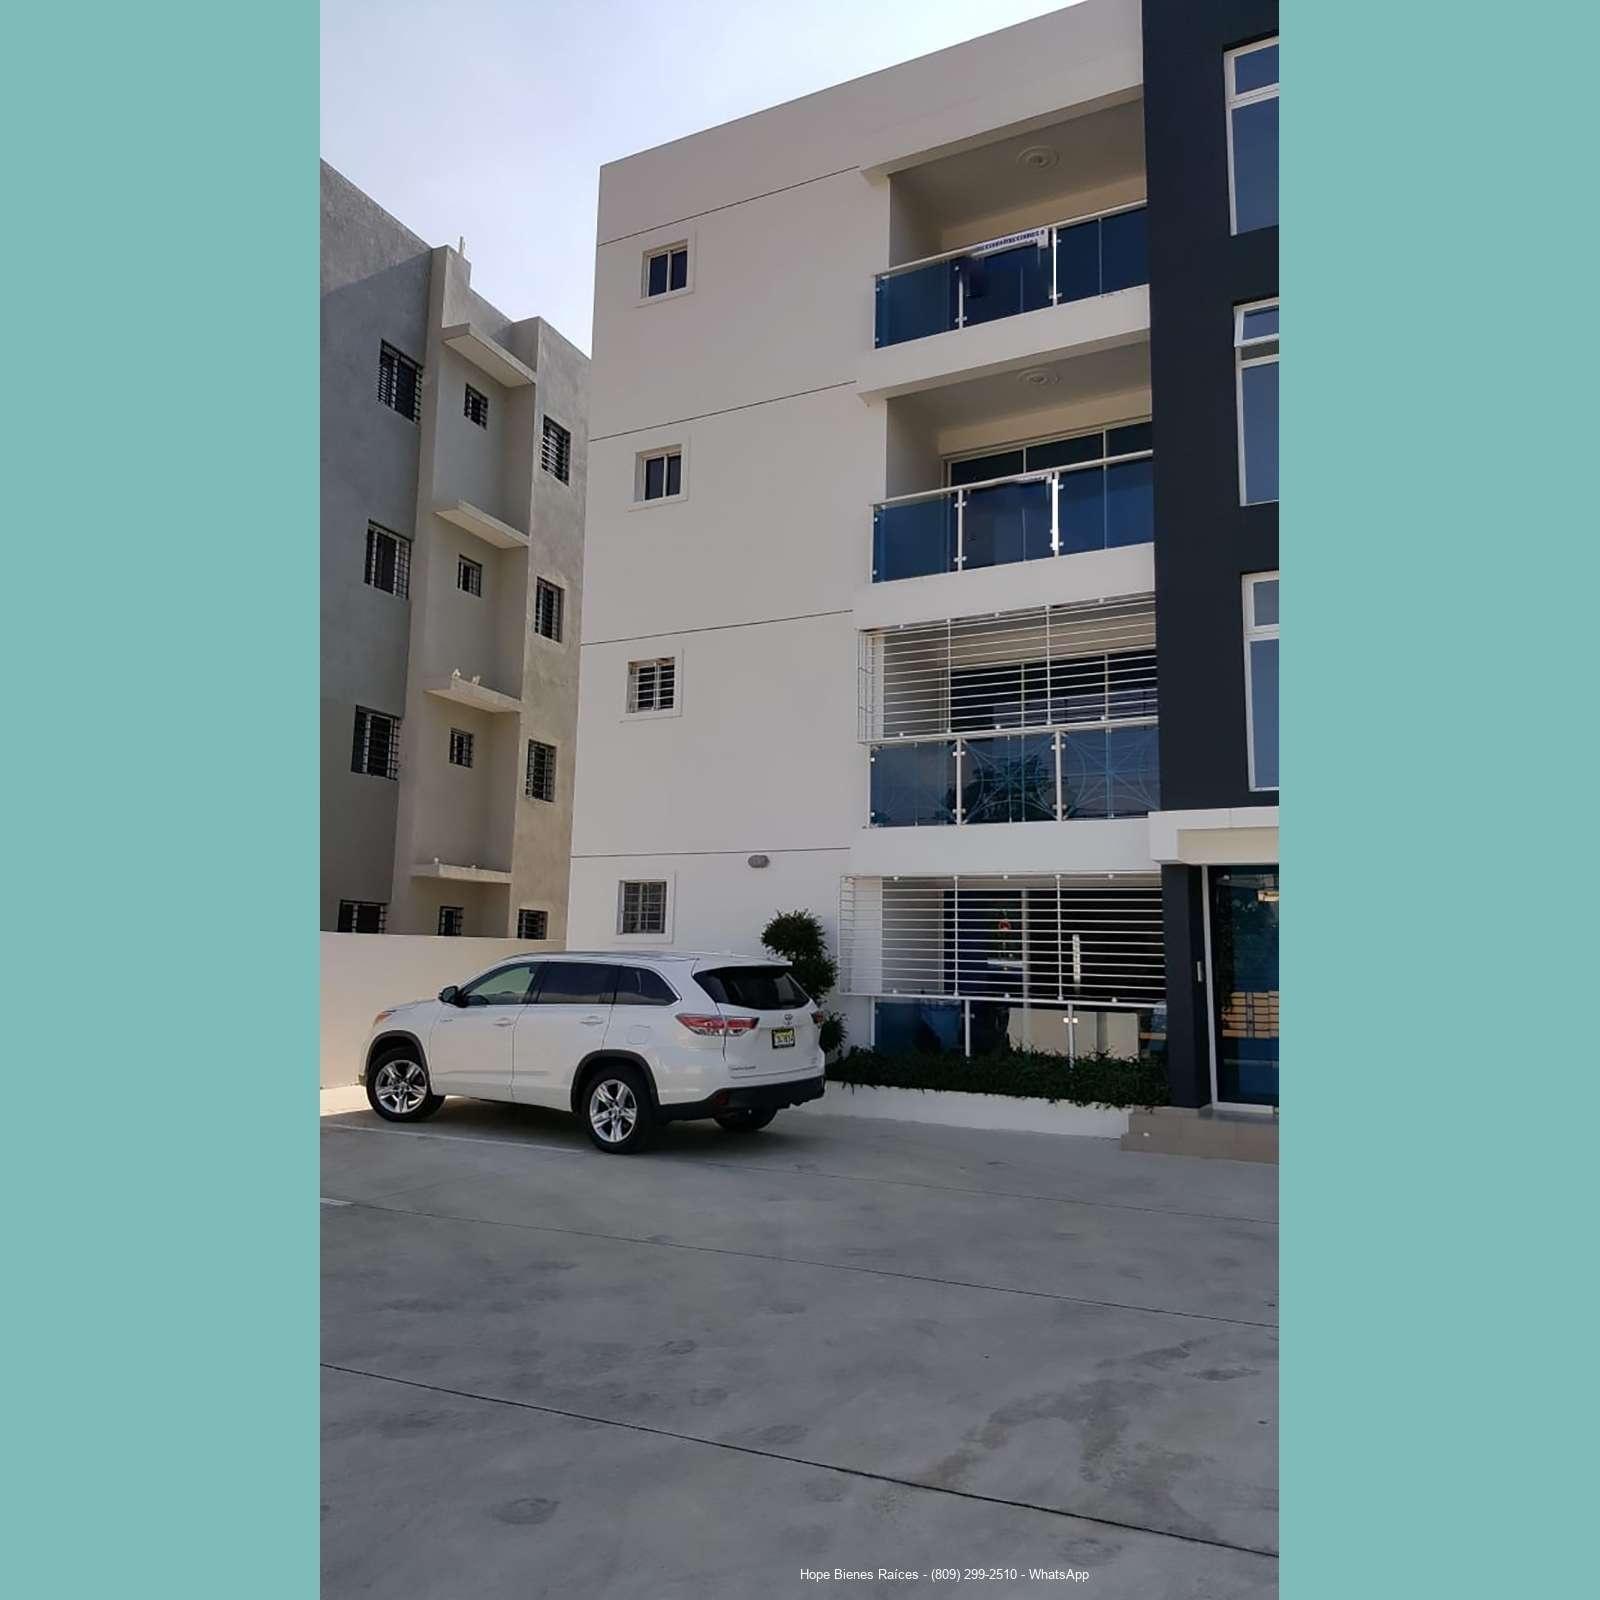 Vendo Apartamento Cerca del HOMS